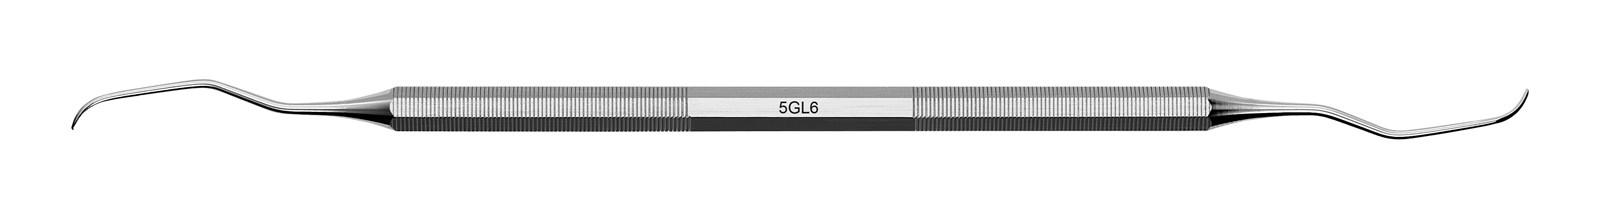 Kyreta Gracey Deep - 5GL6, ADEP růžový